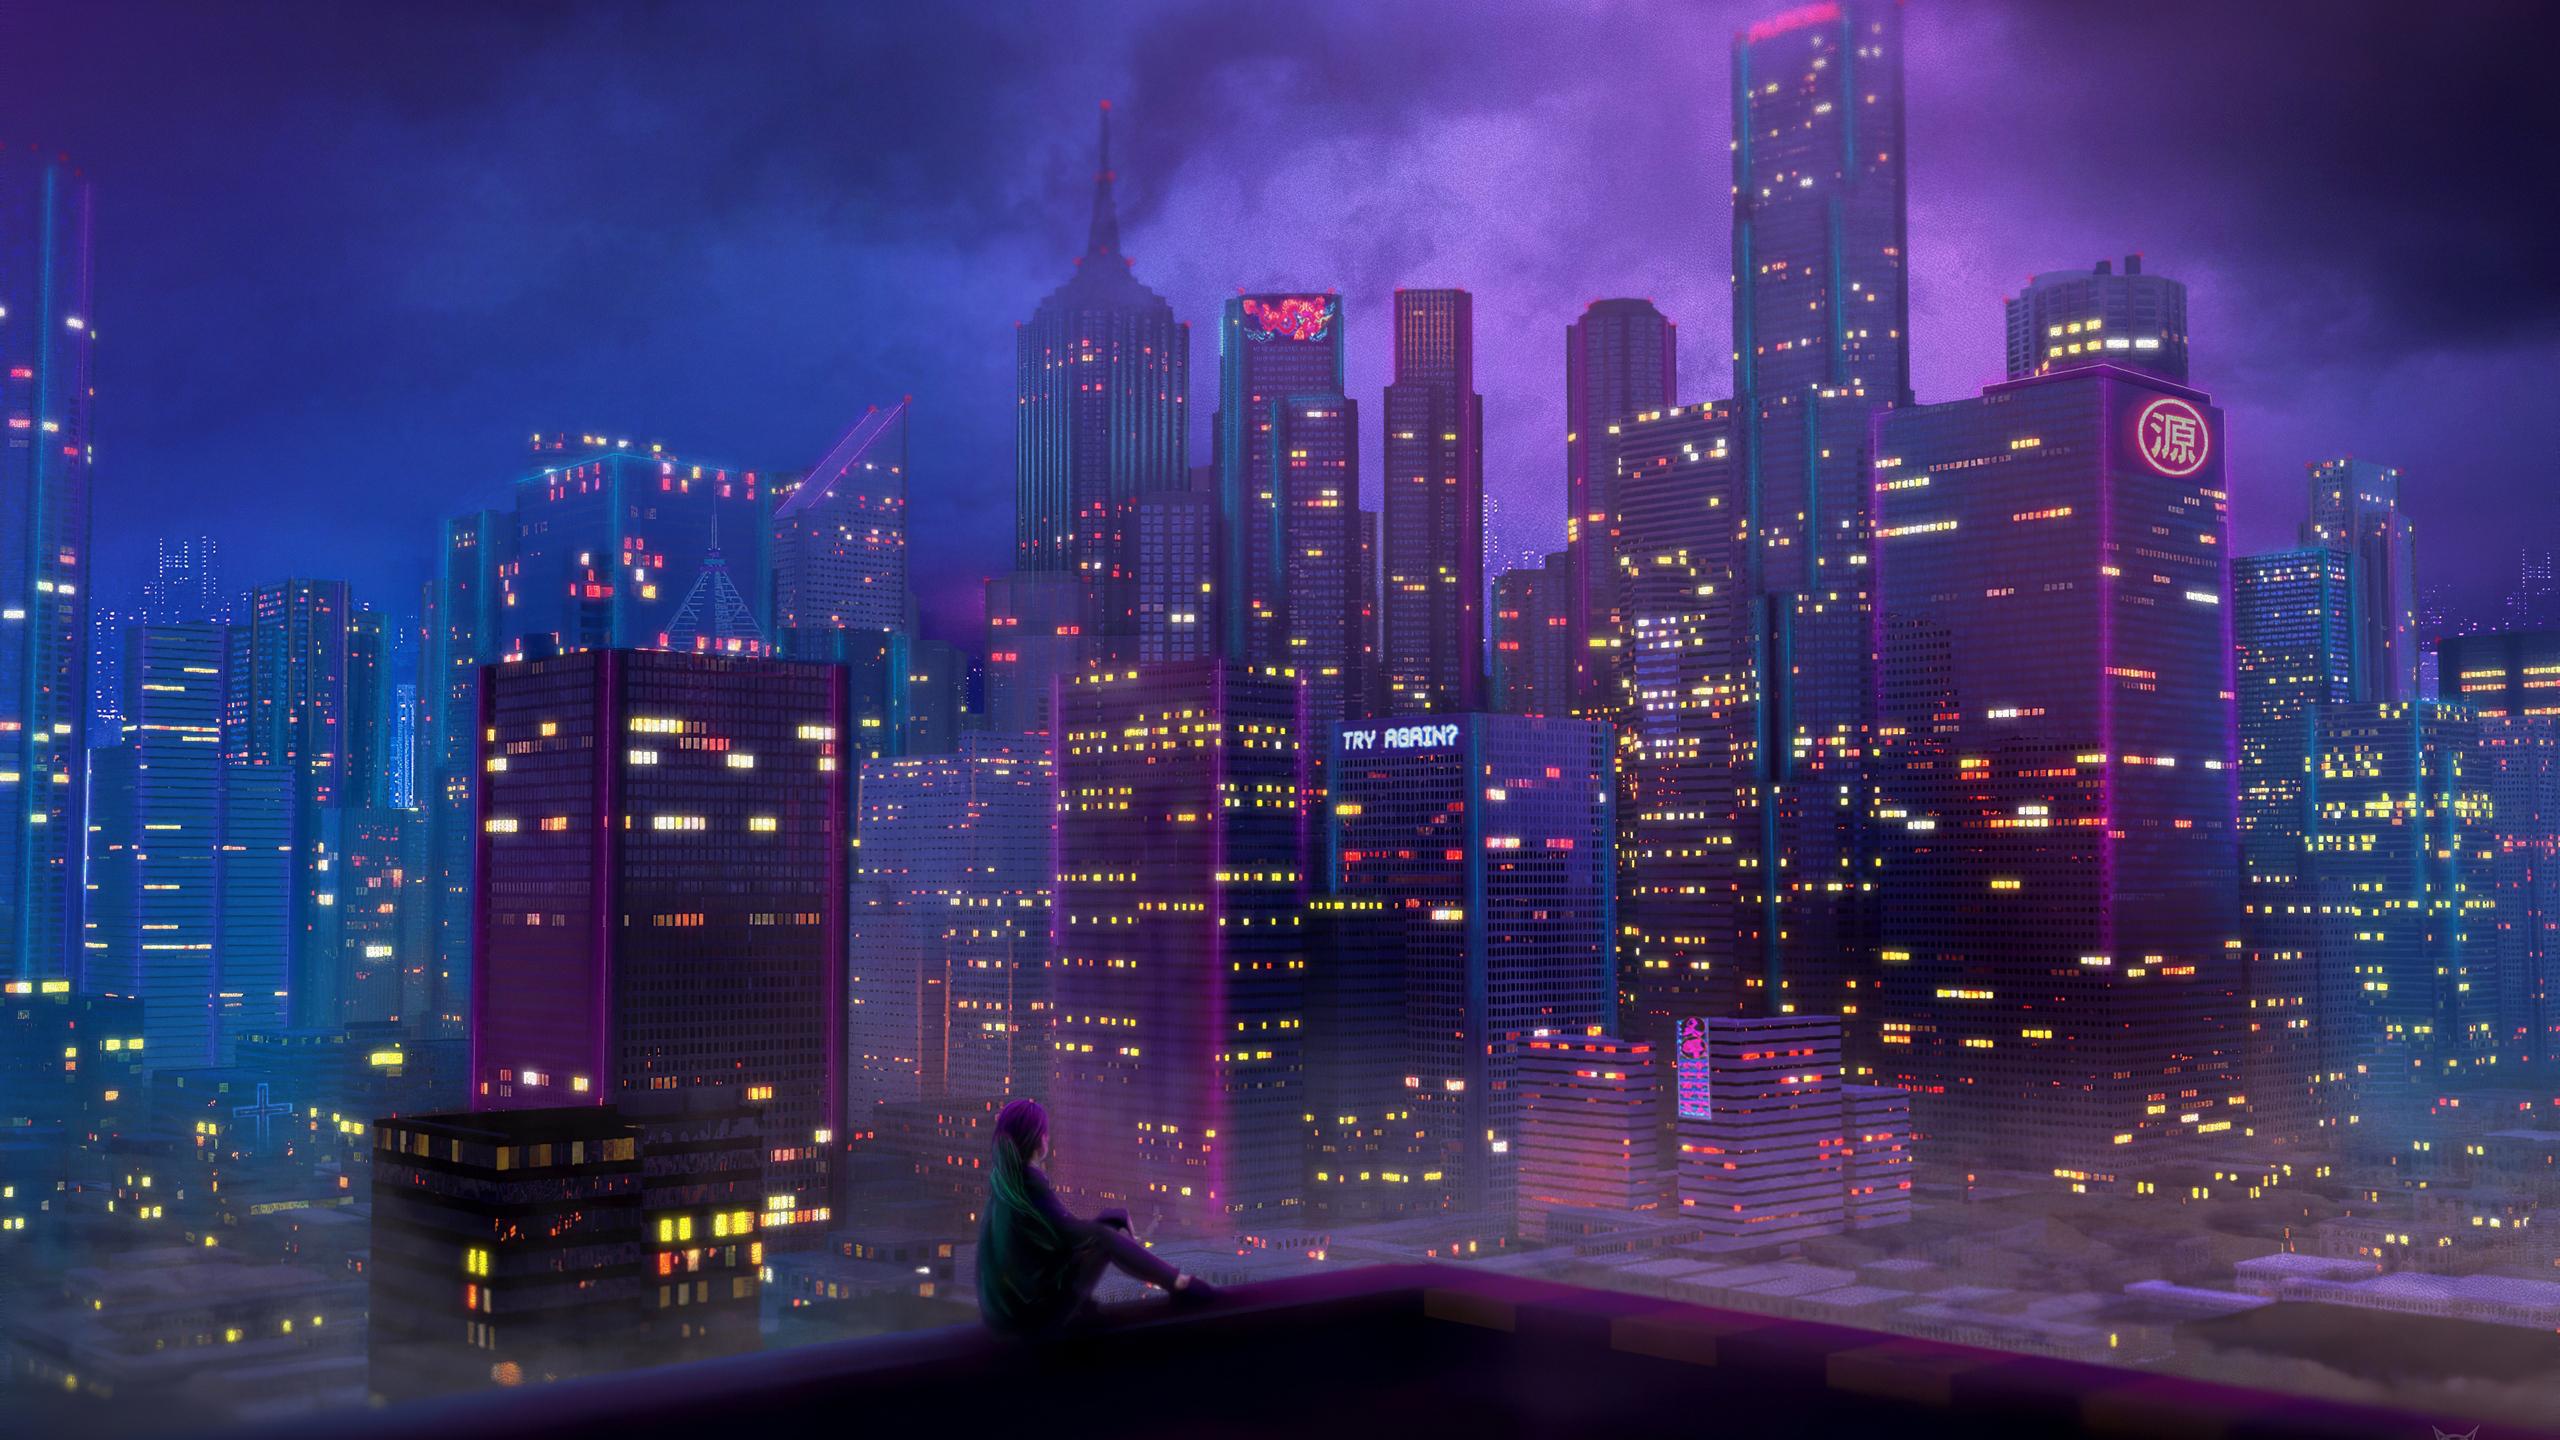 2560x1440 Anime City Girl 4k 1440P Resolution HD 4k ...